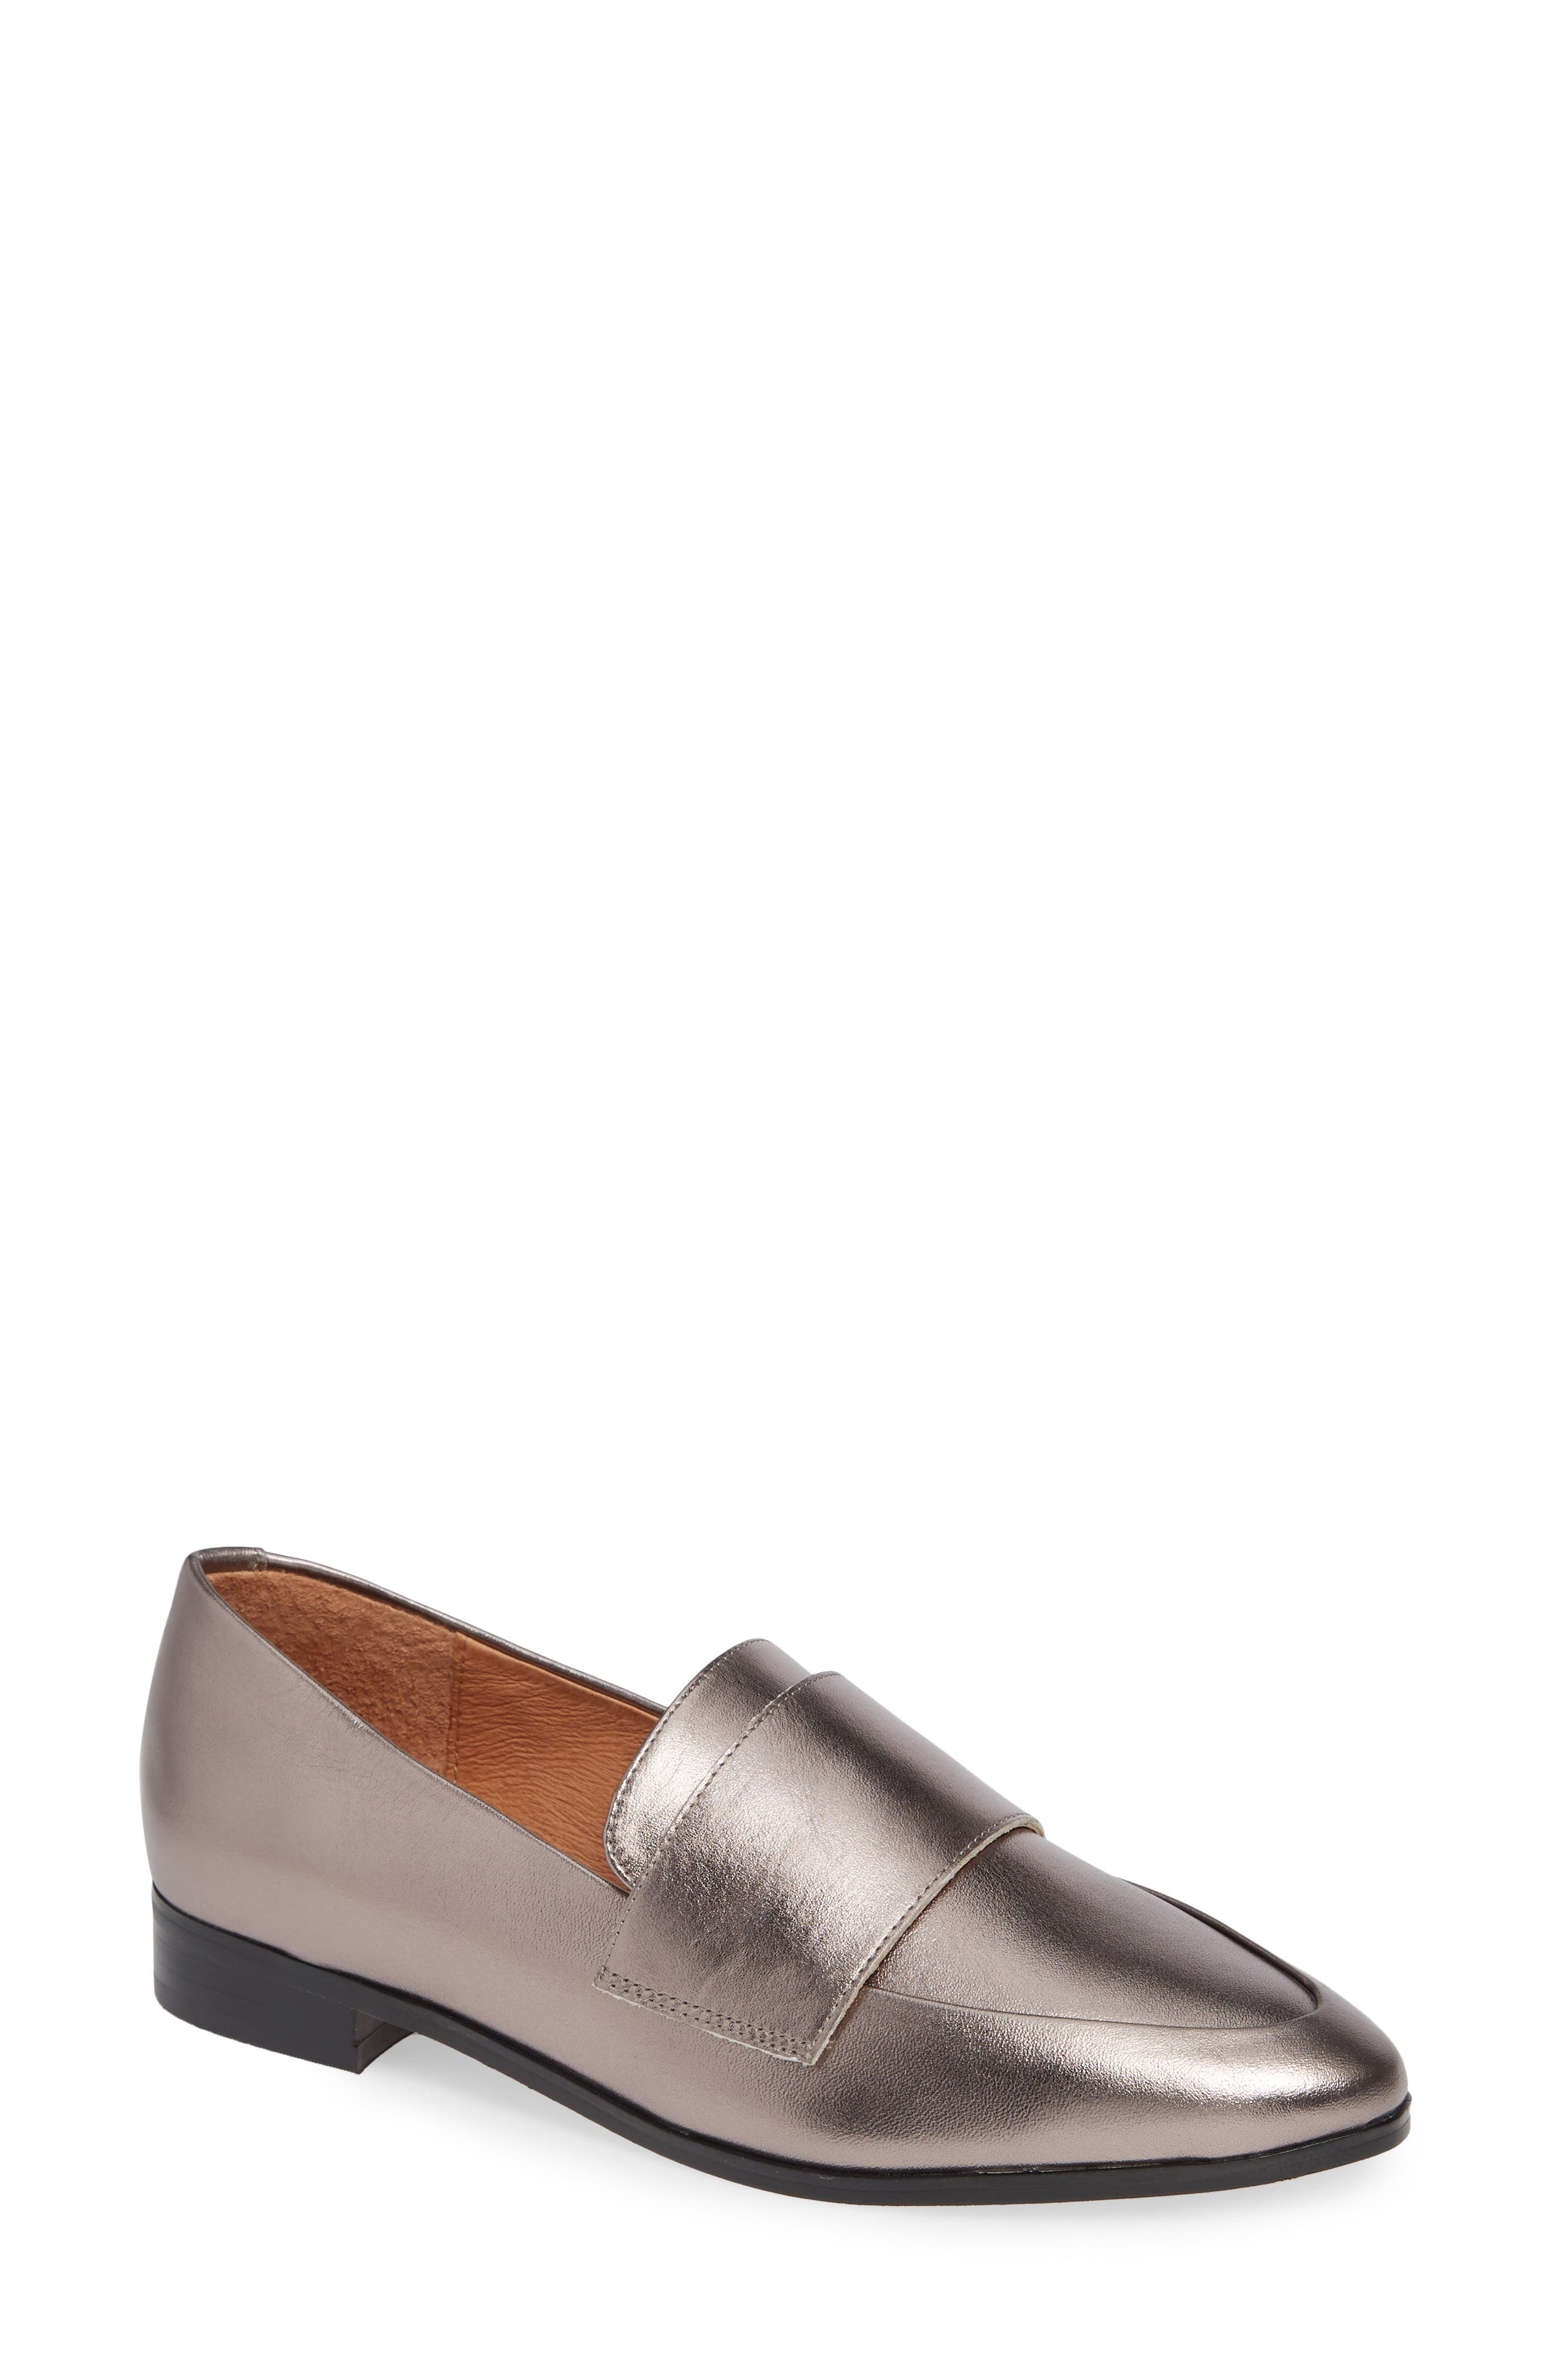 Damens's Metallic Metallic Metallic Flat Loafers, Slip Ons & Moccasins   Nordstrom 04bfd5